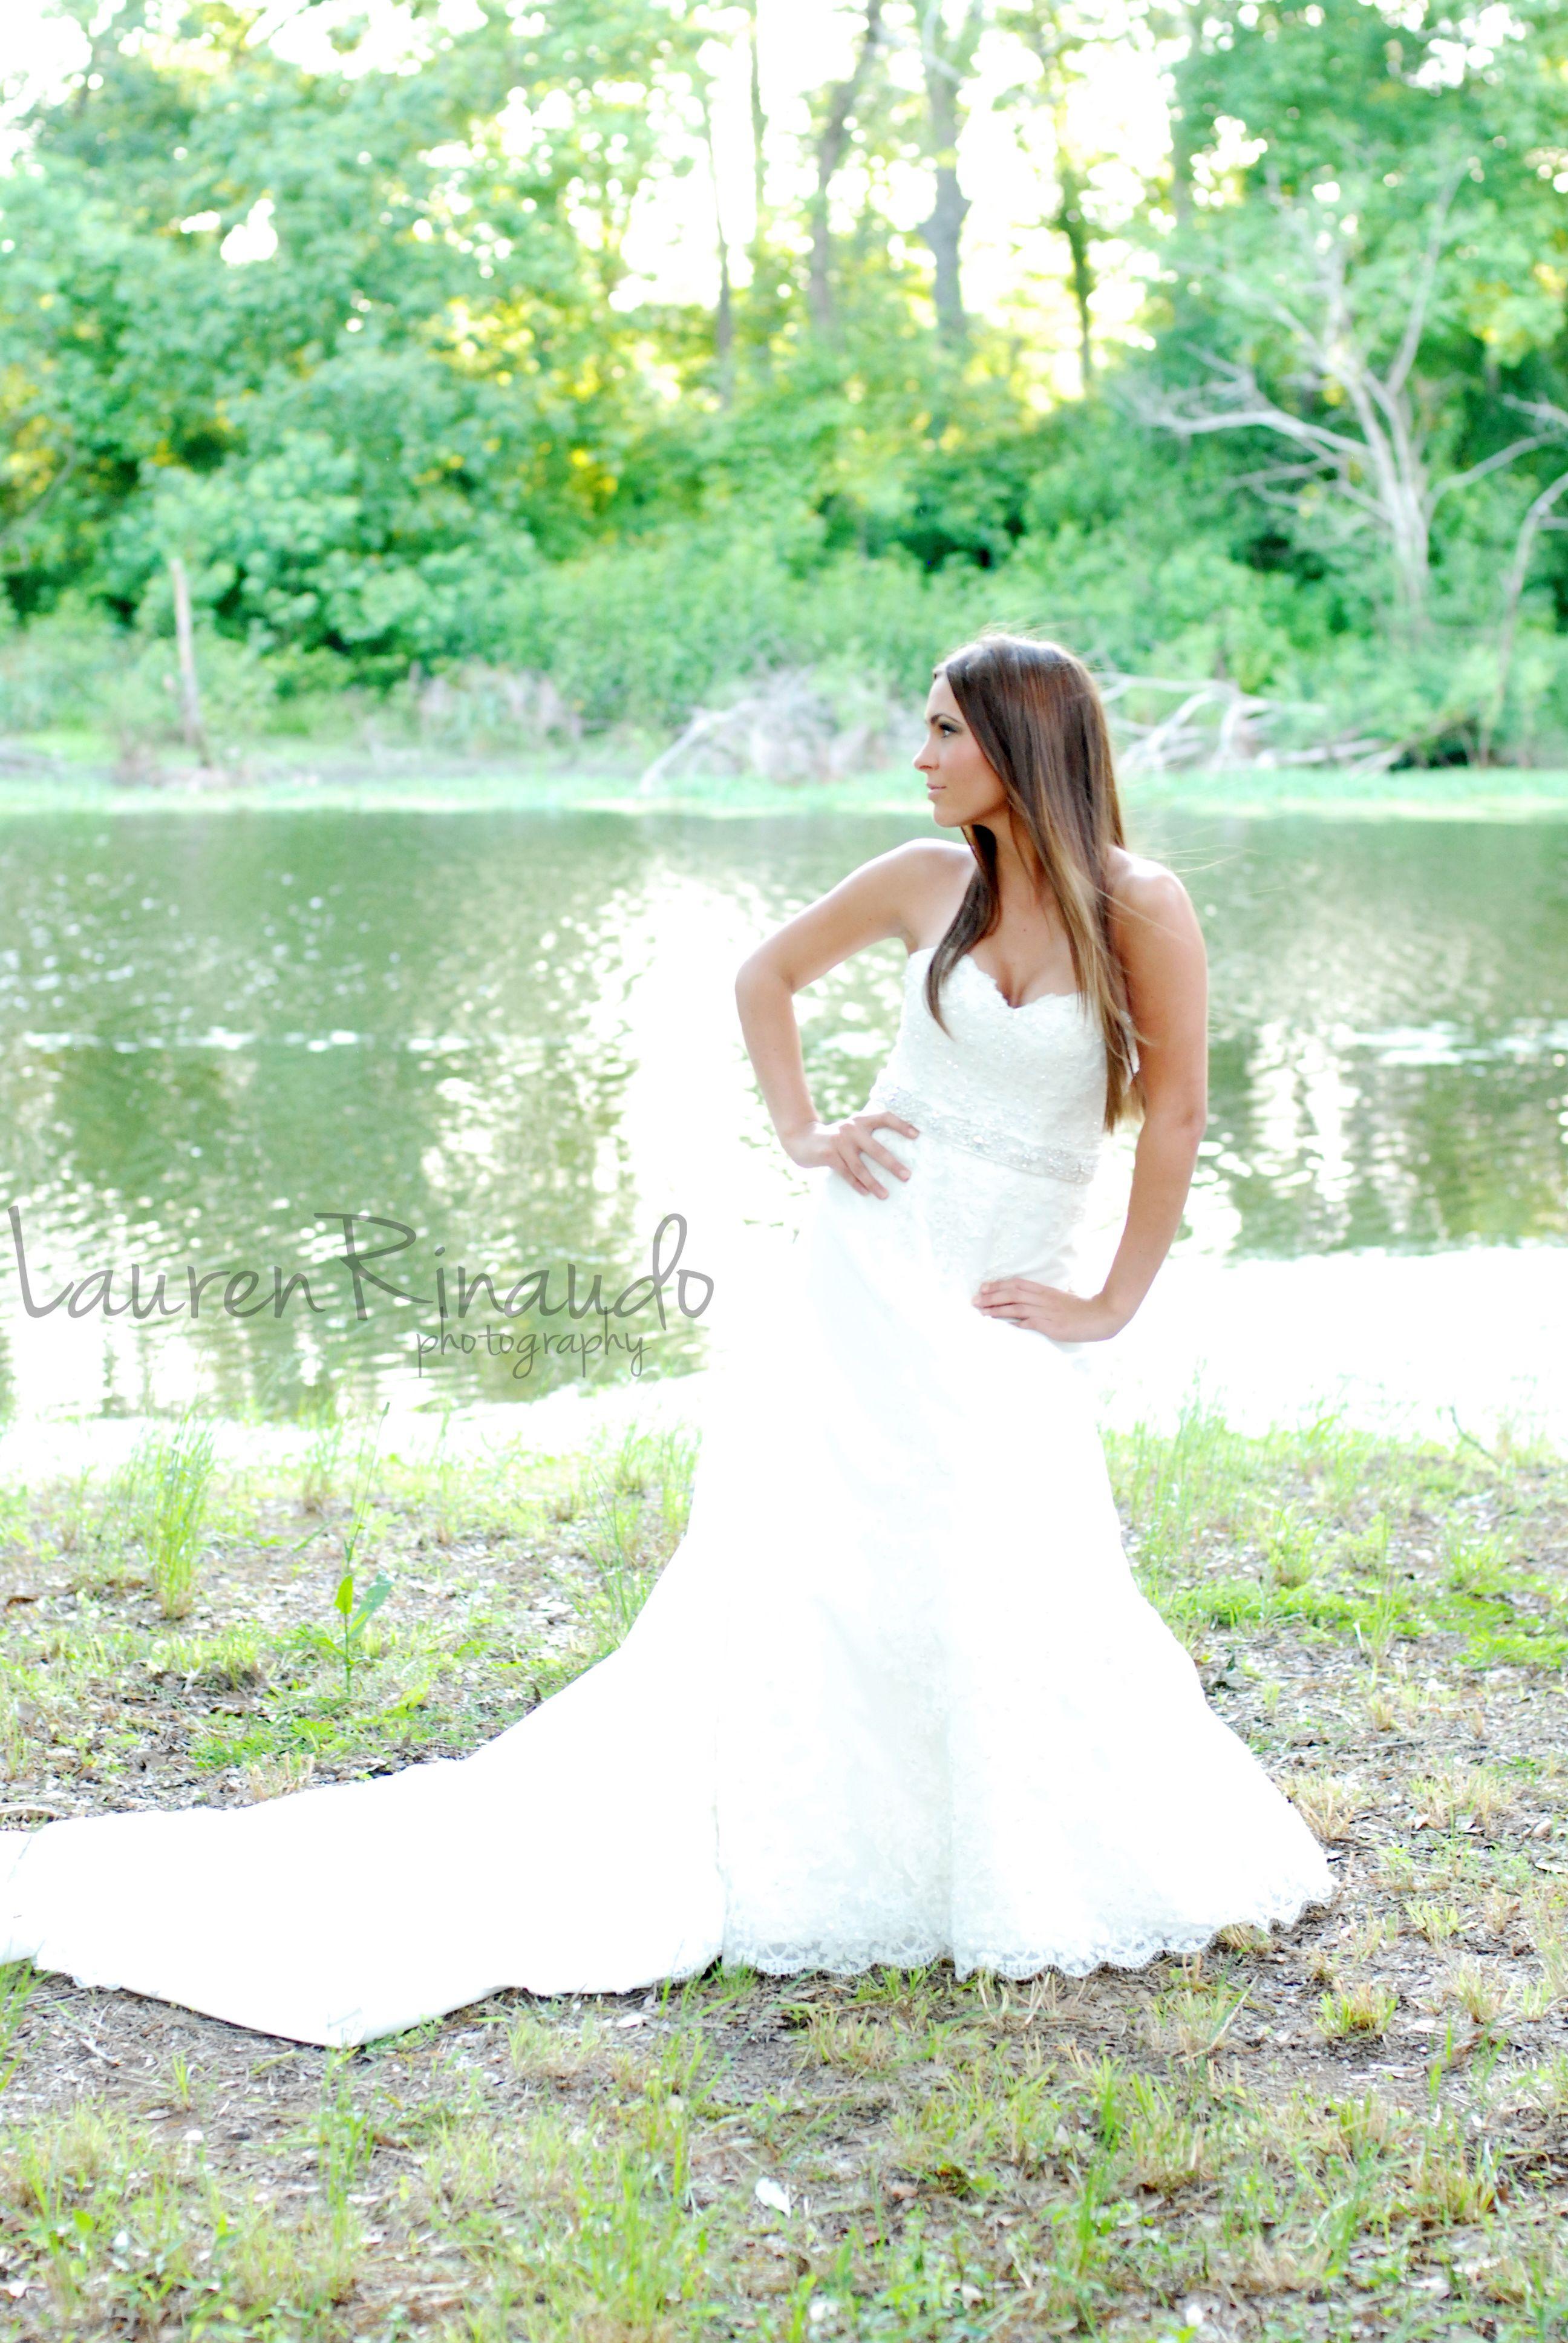 Photography Bridals Weddingphotography Southern Louisiana Photog Laurenrinaudophotography